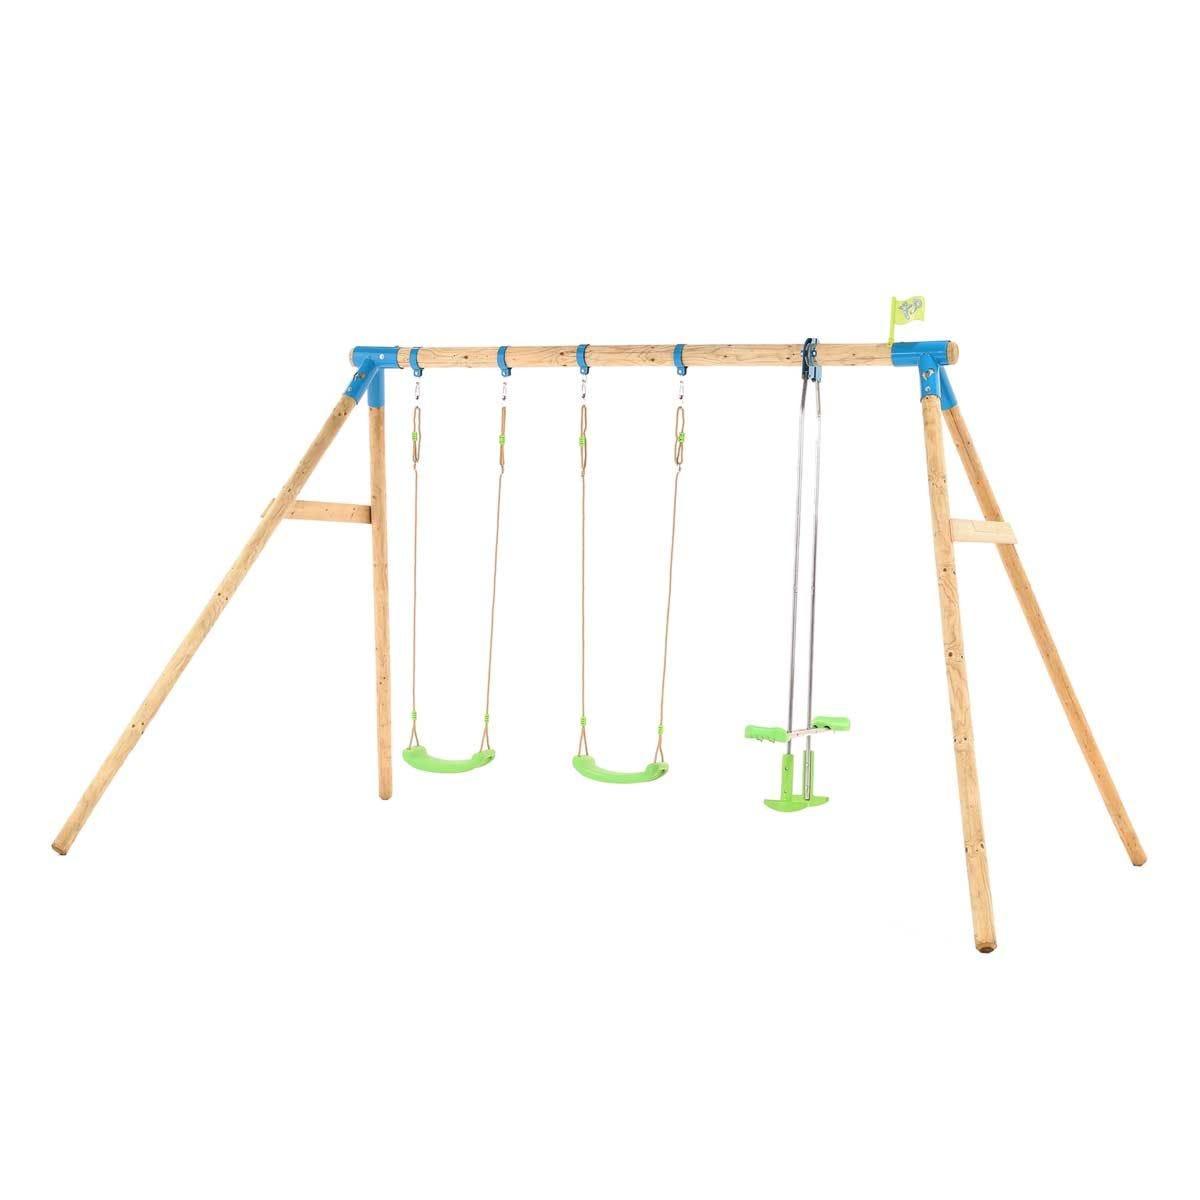 TP Toys Woburn Wooden Triple Swing Set